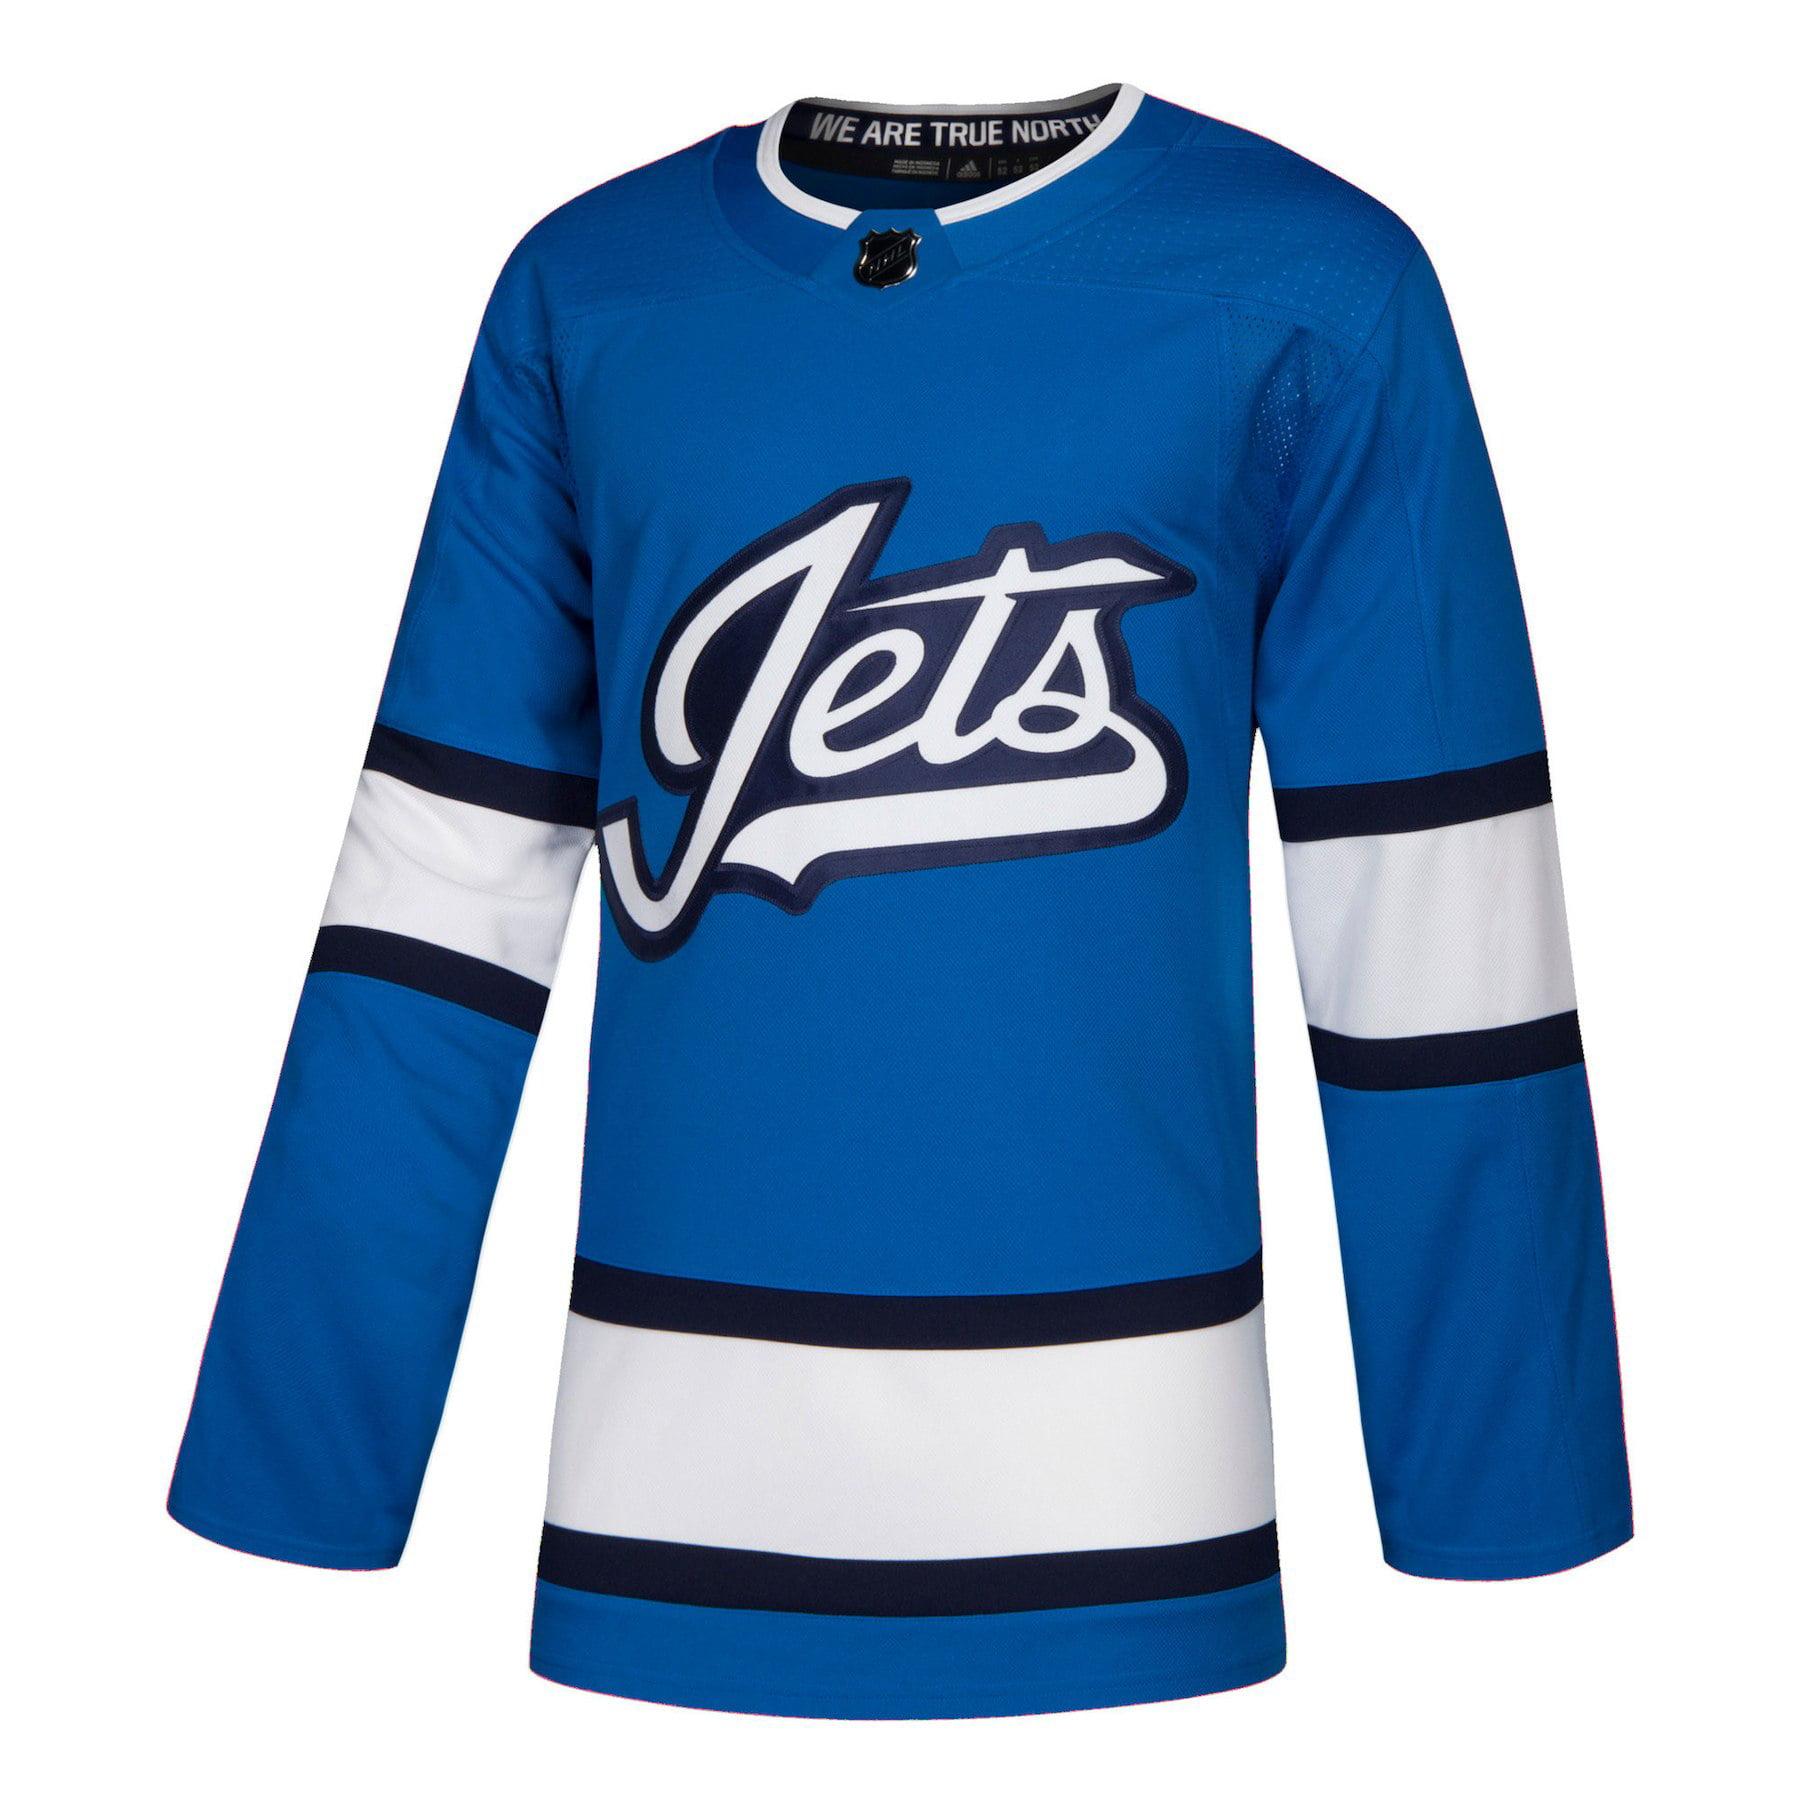 bd0f36f84 discount winnipeg jets heritage classic jerseys f71e3 17848; inexpensive  winnipeg jets adidas adizero nhl authentic pro alternate jersey ca290 e2a05